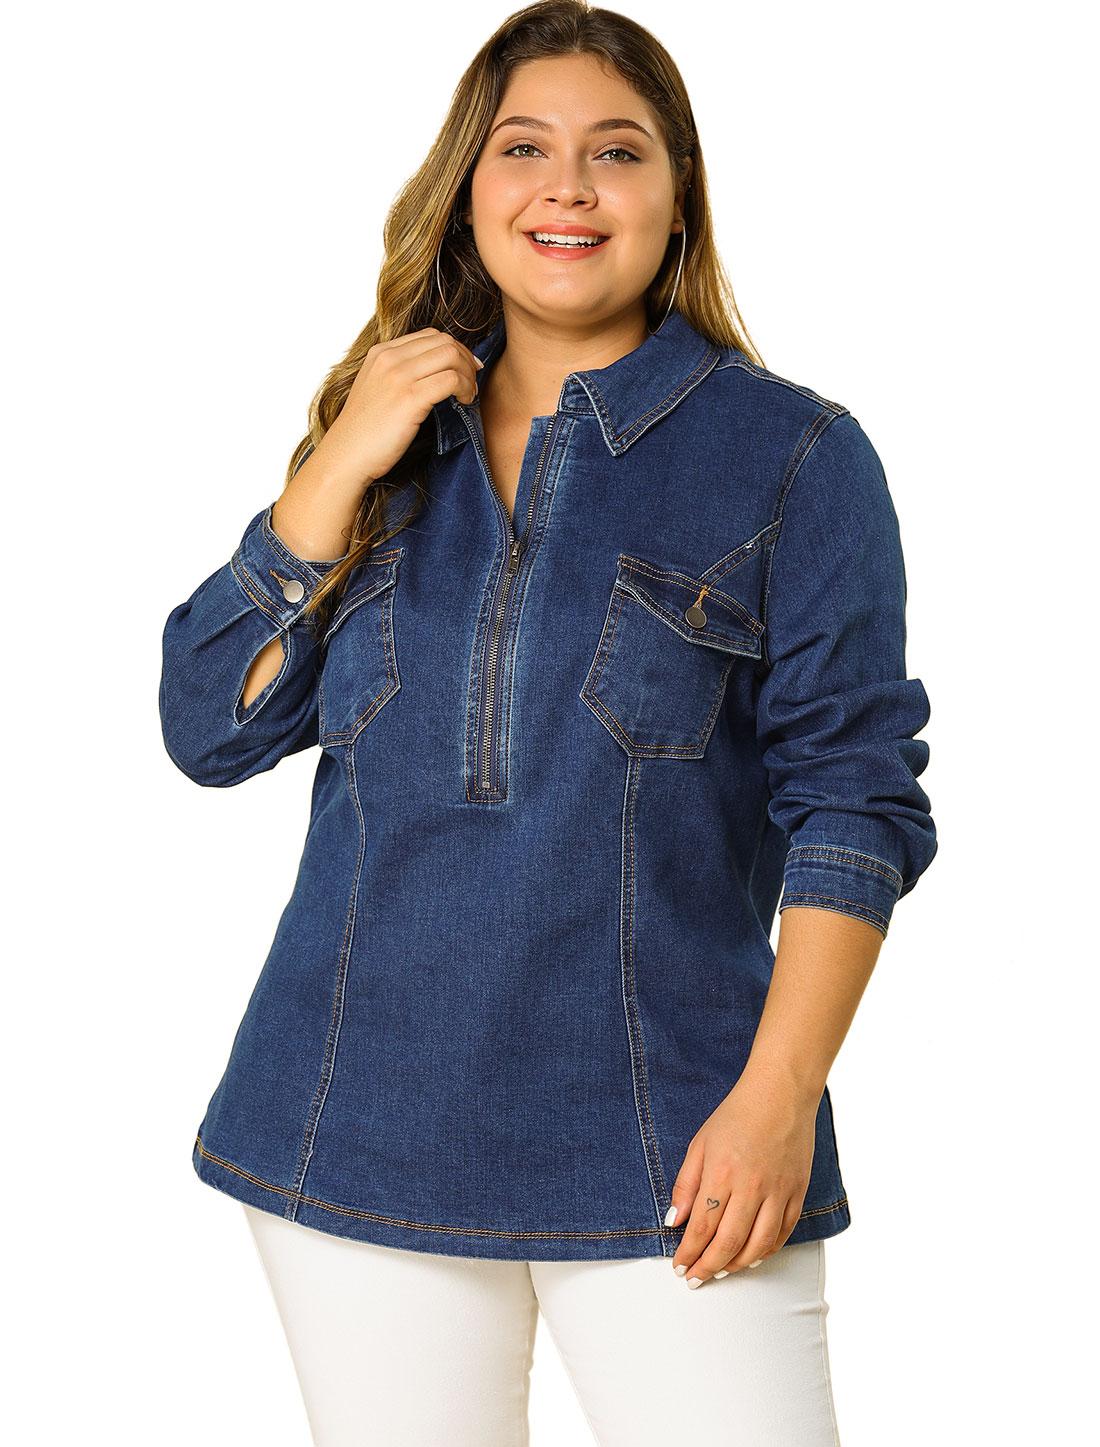 Agnes Orinda Women's Plus Size Zip Up Denim Jacket with Pockets Dark Blue 2X